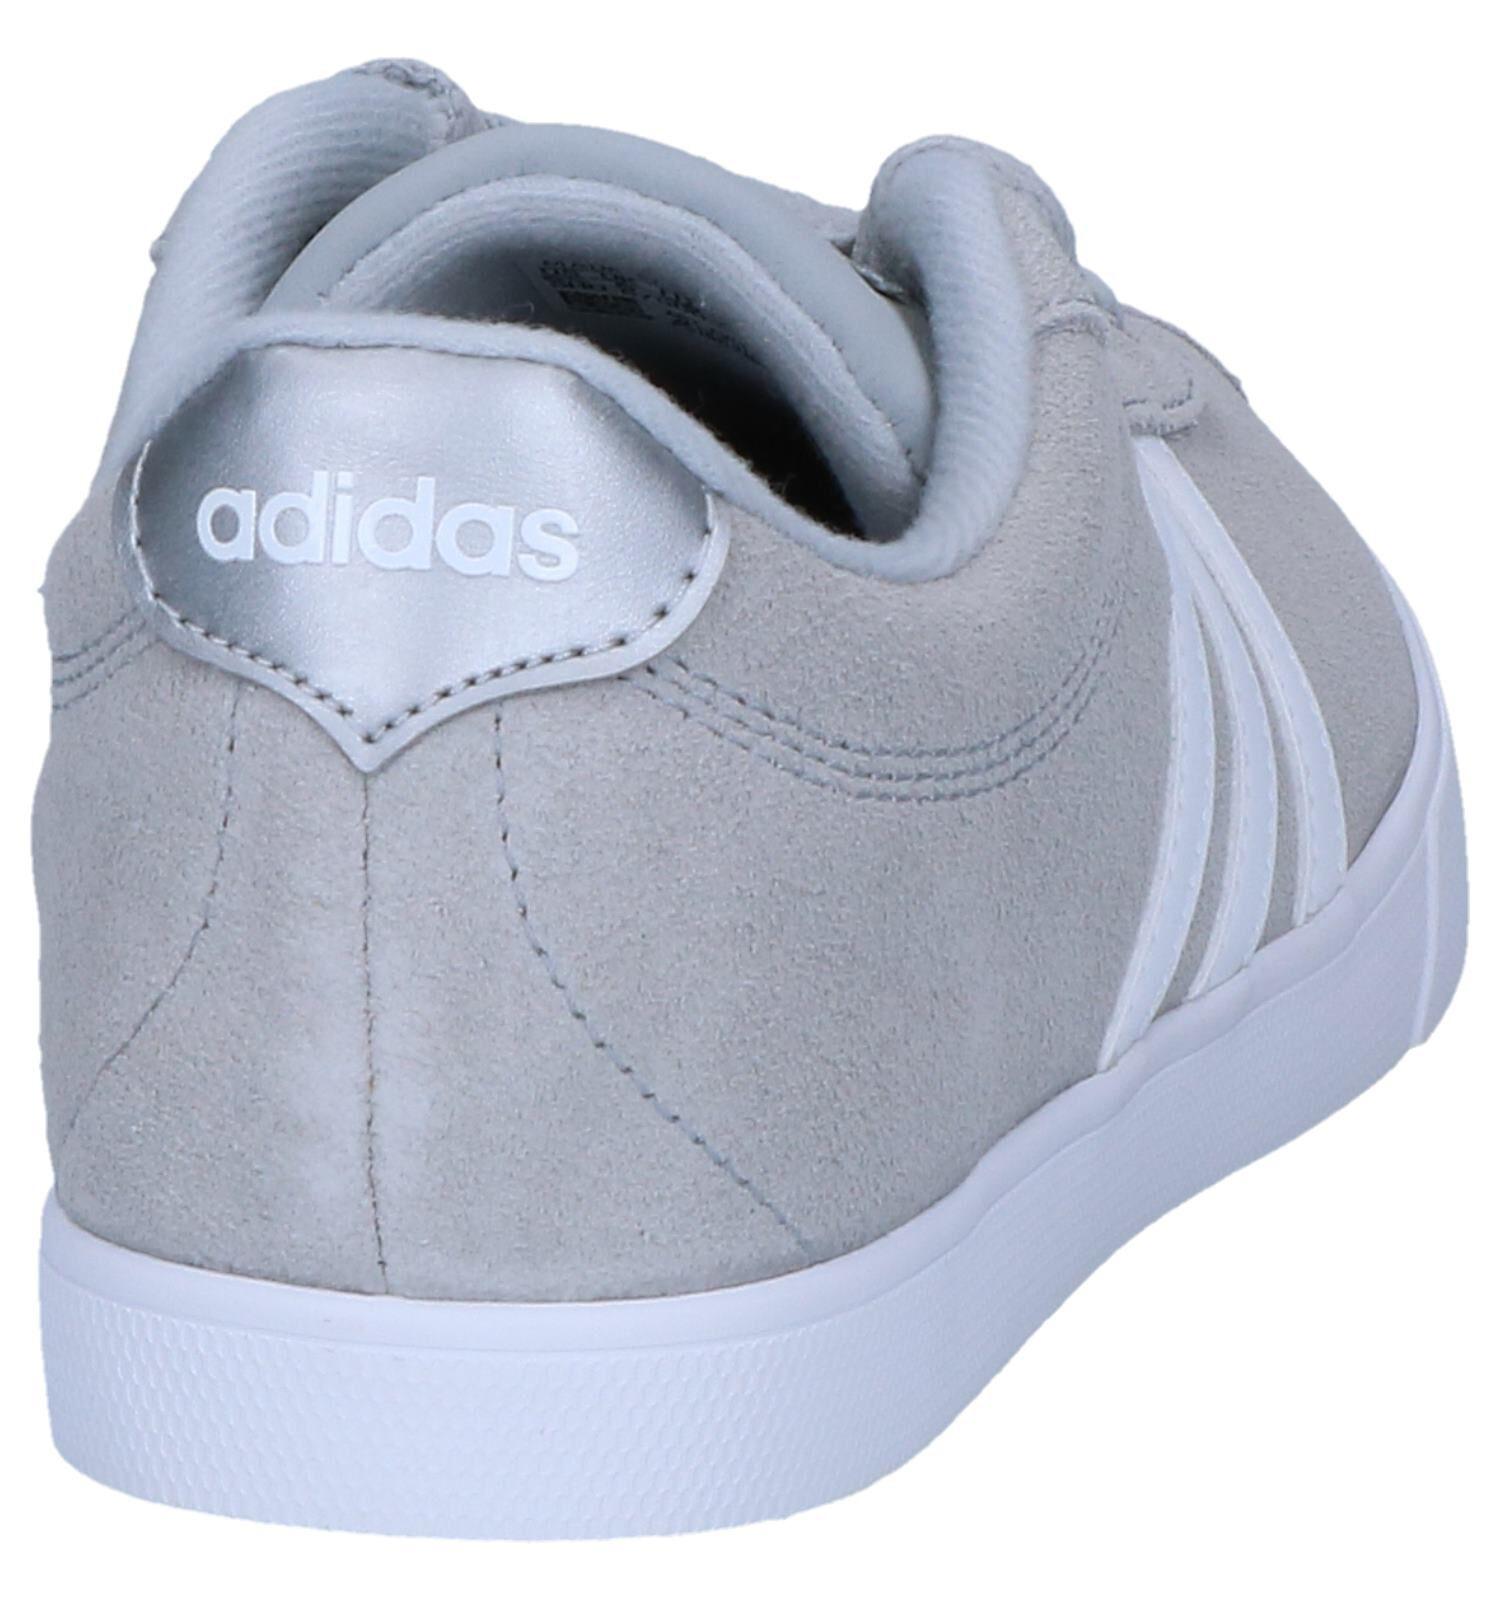 adidas Courtset Lichtgrijze Sneakers